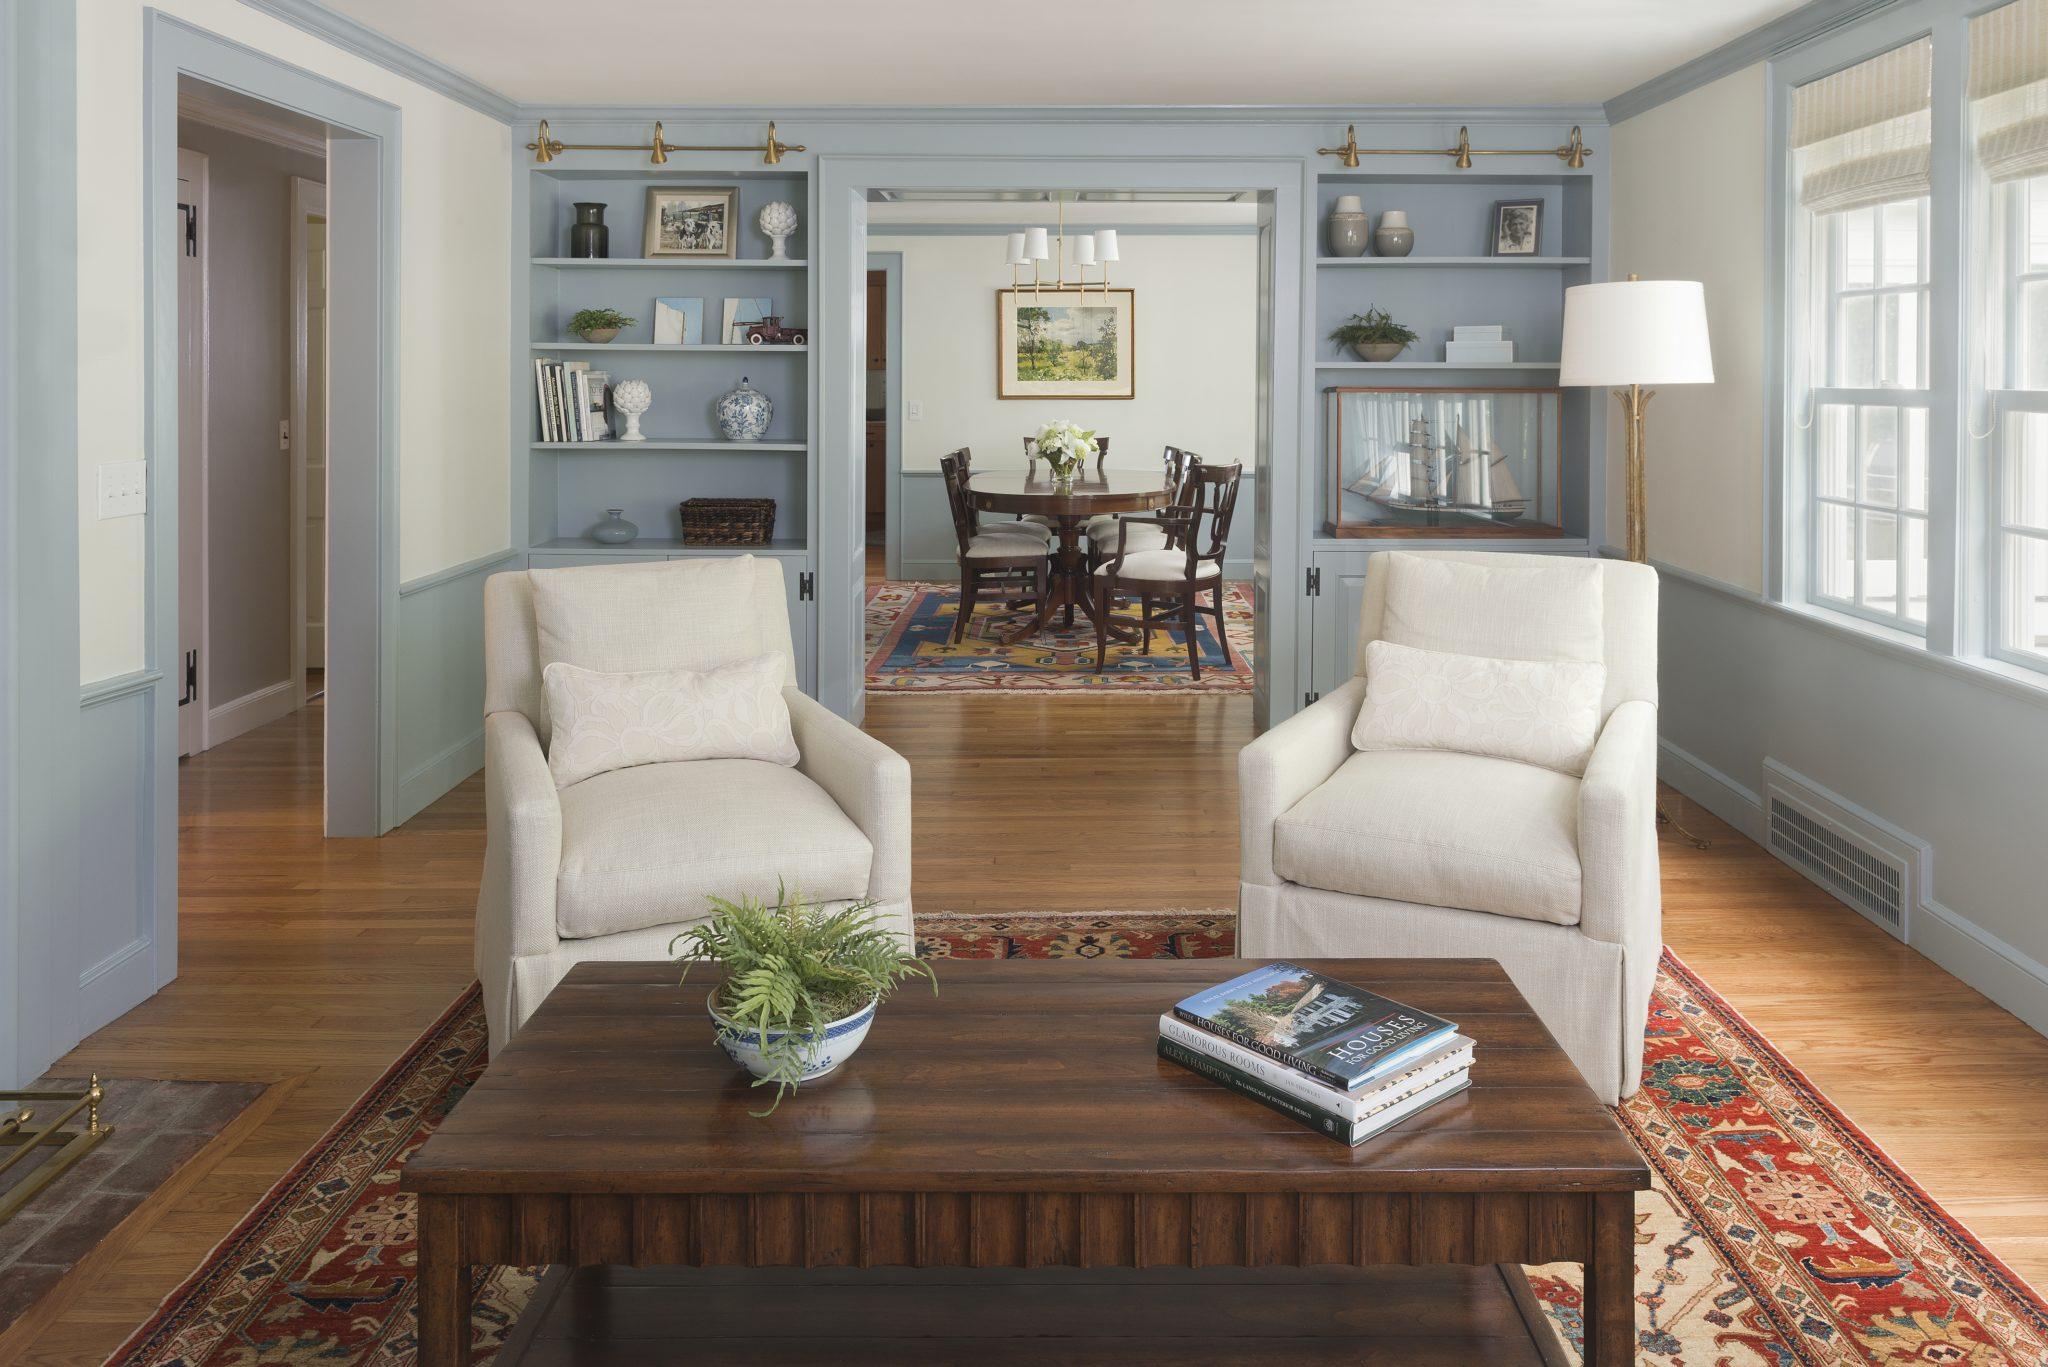 Interior design by Pinney Designs